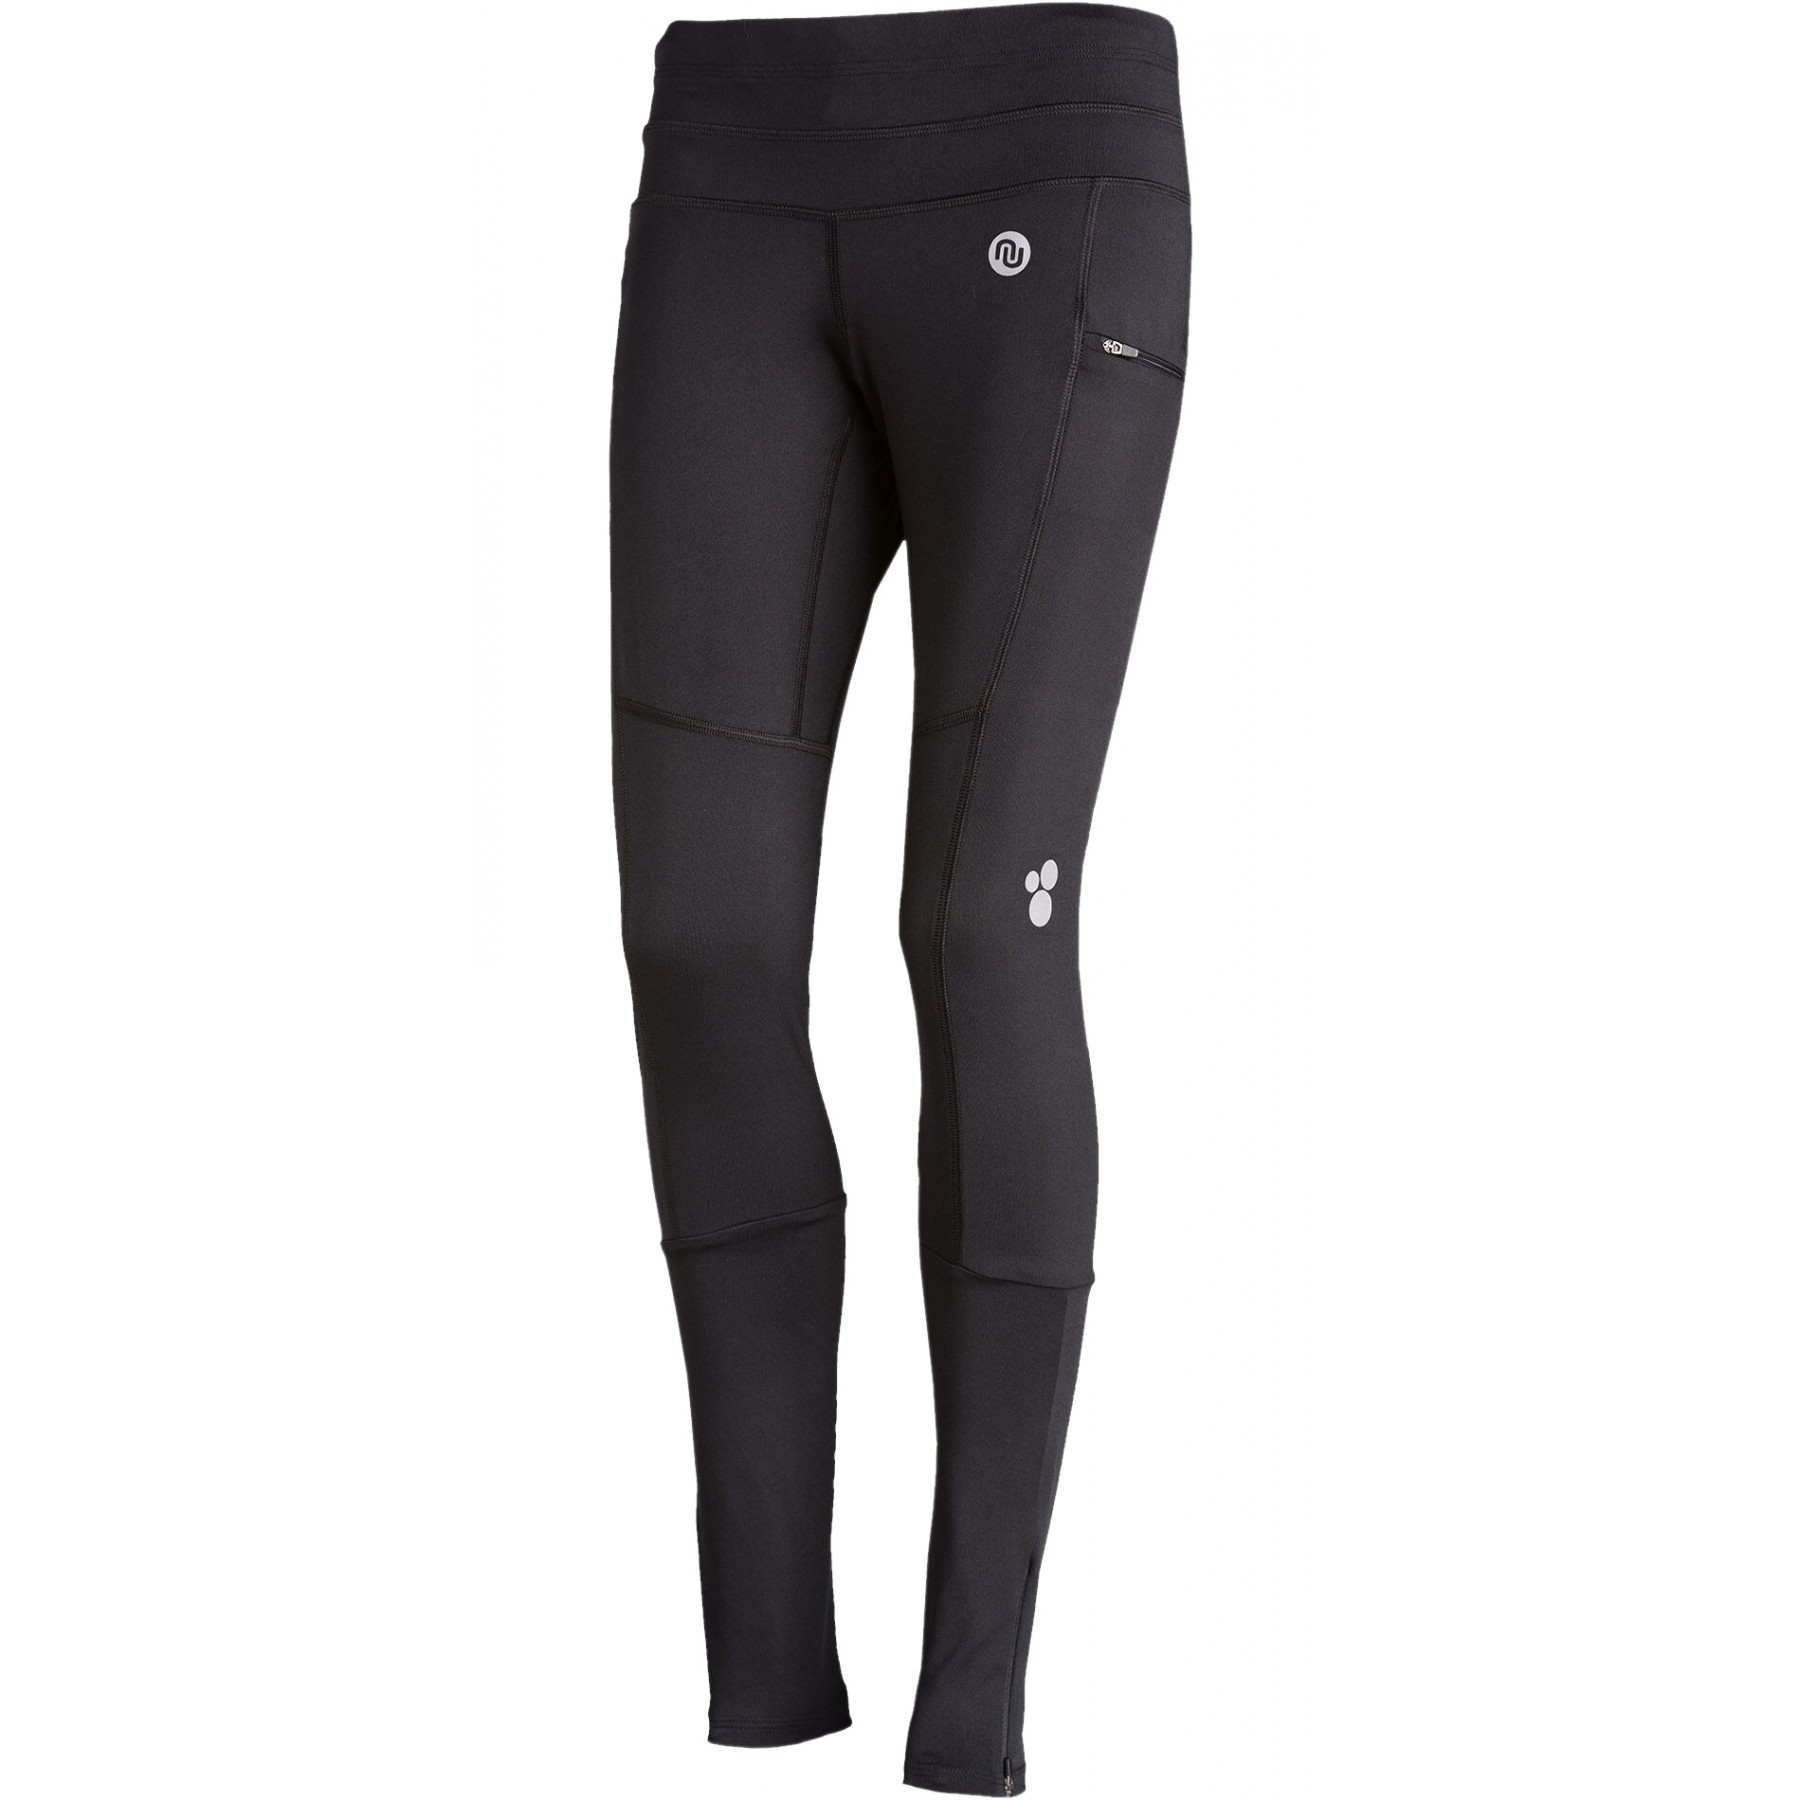 nessi damen sport leggings pro total sdp laufhose. Black Bedroom Furniture Sets. Home Design Ideas